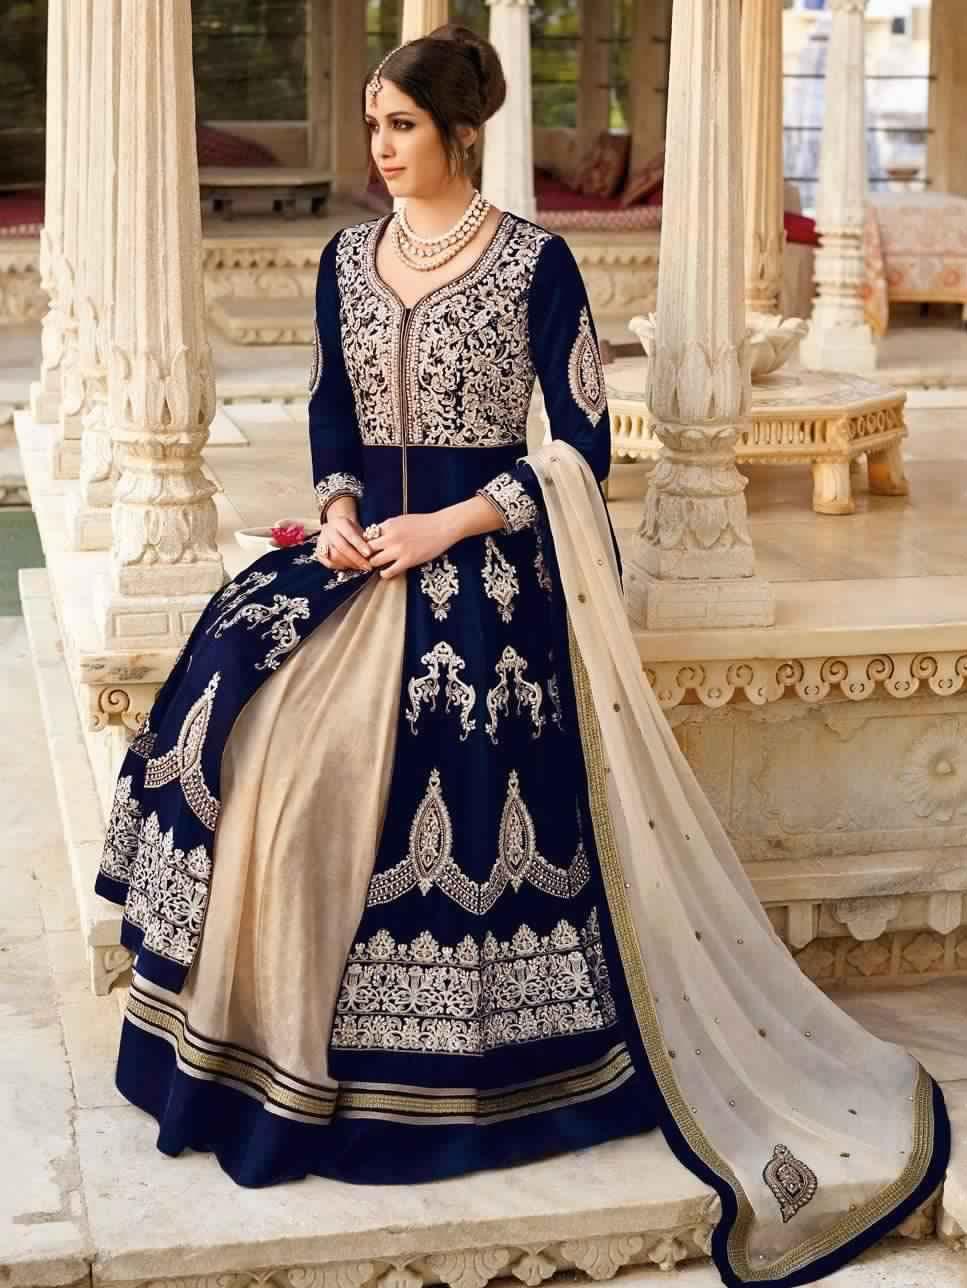 Saree Indien Bleu Et Beige3